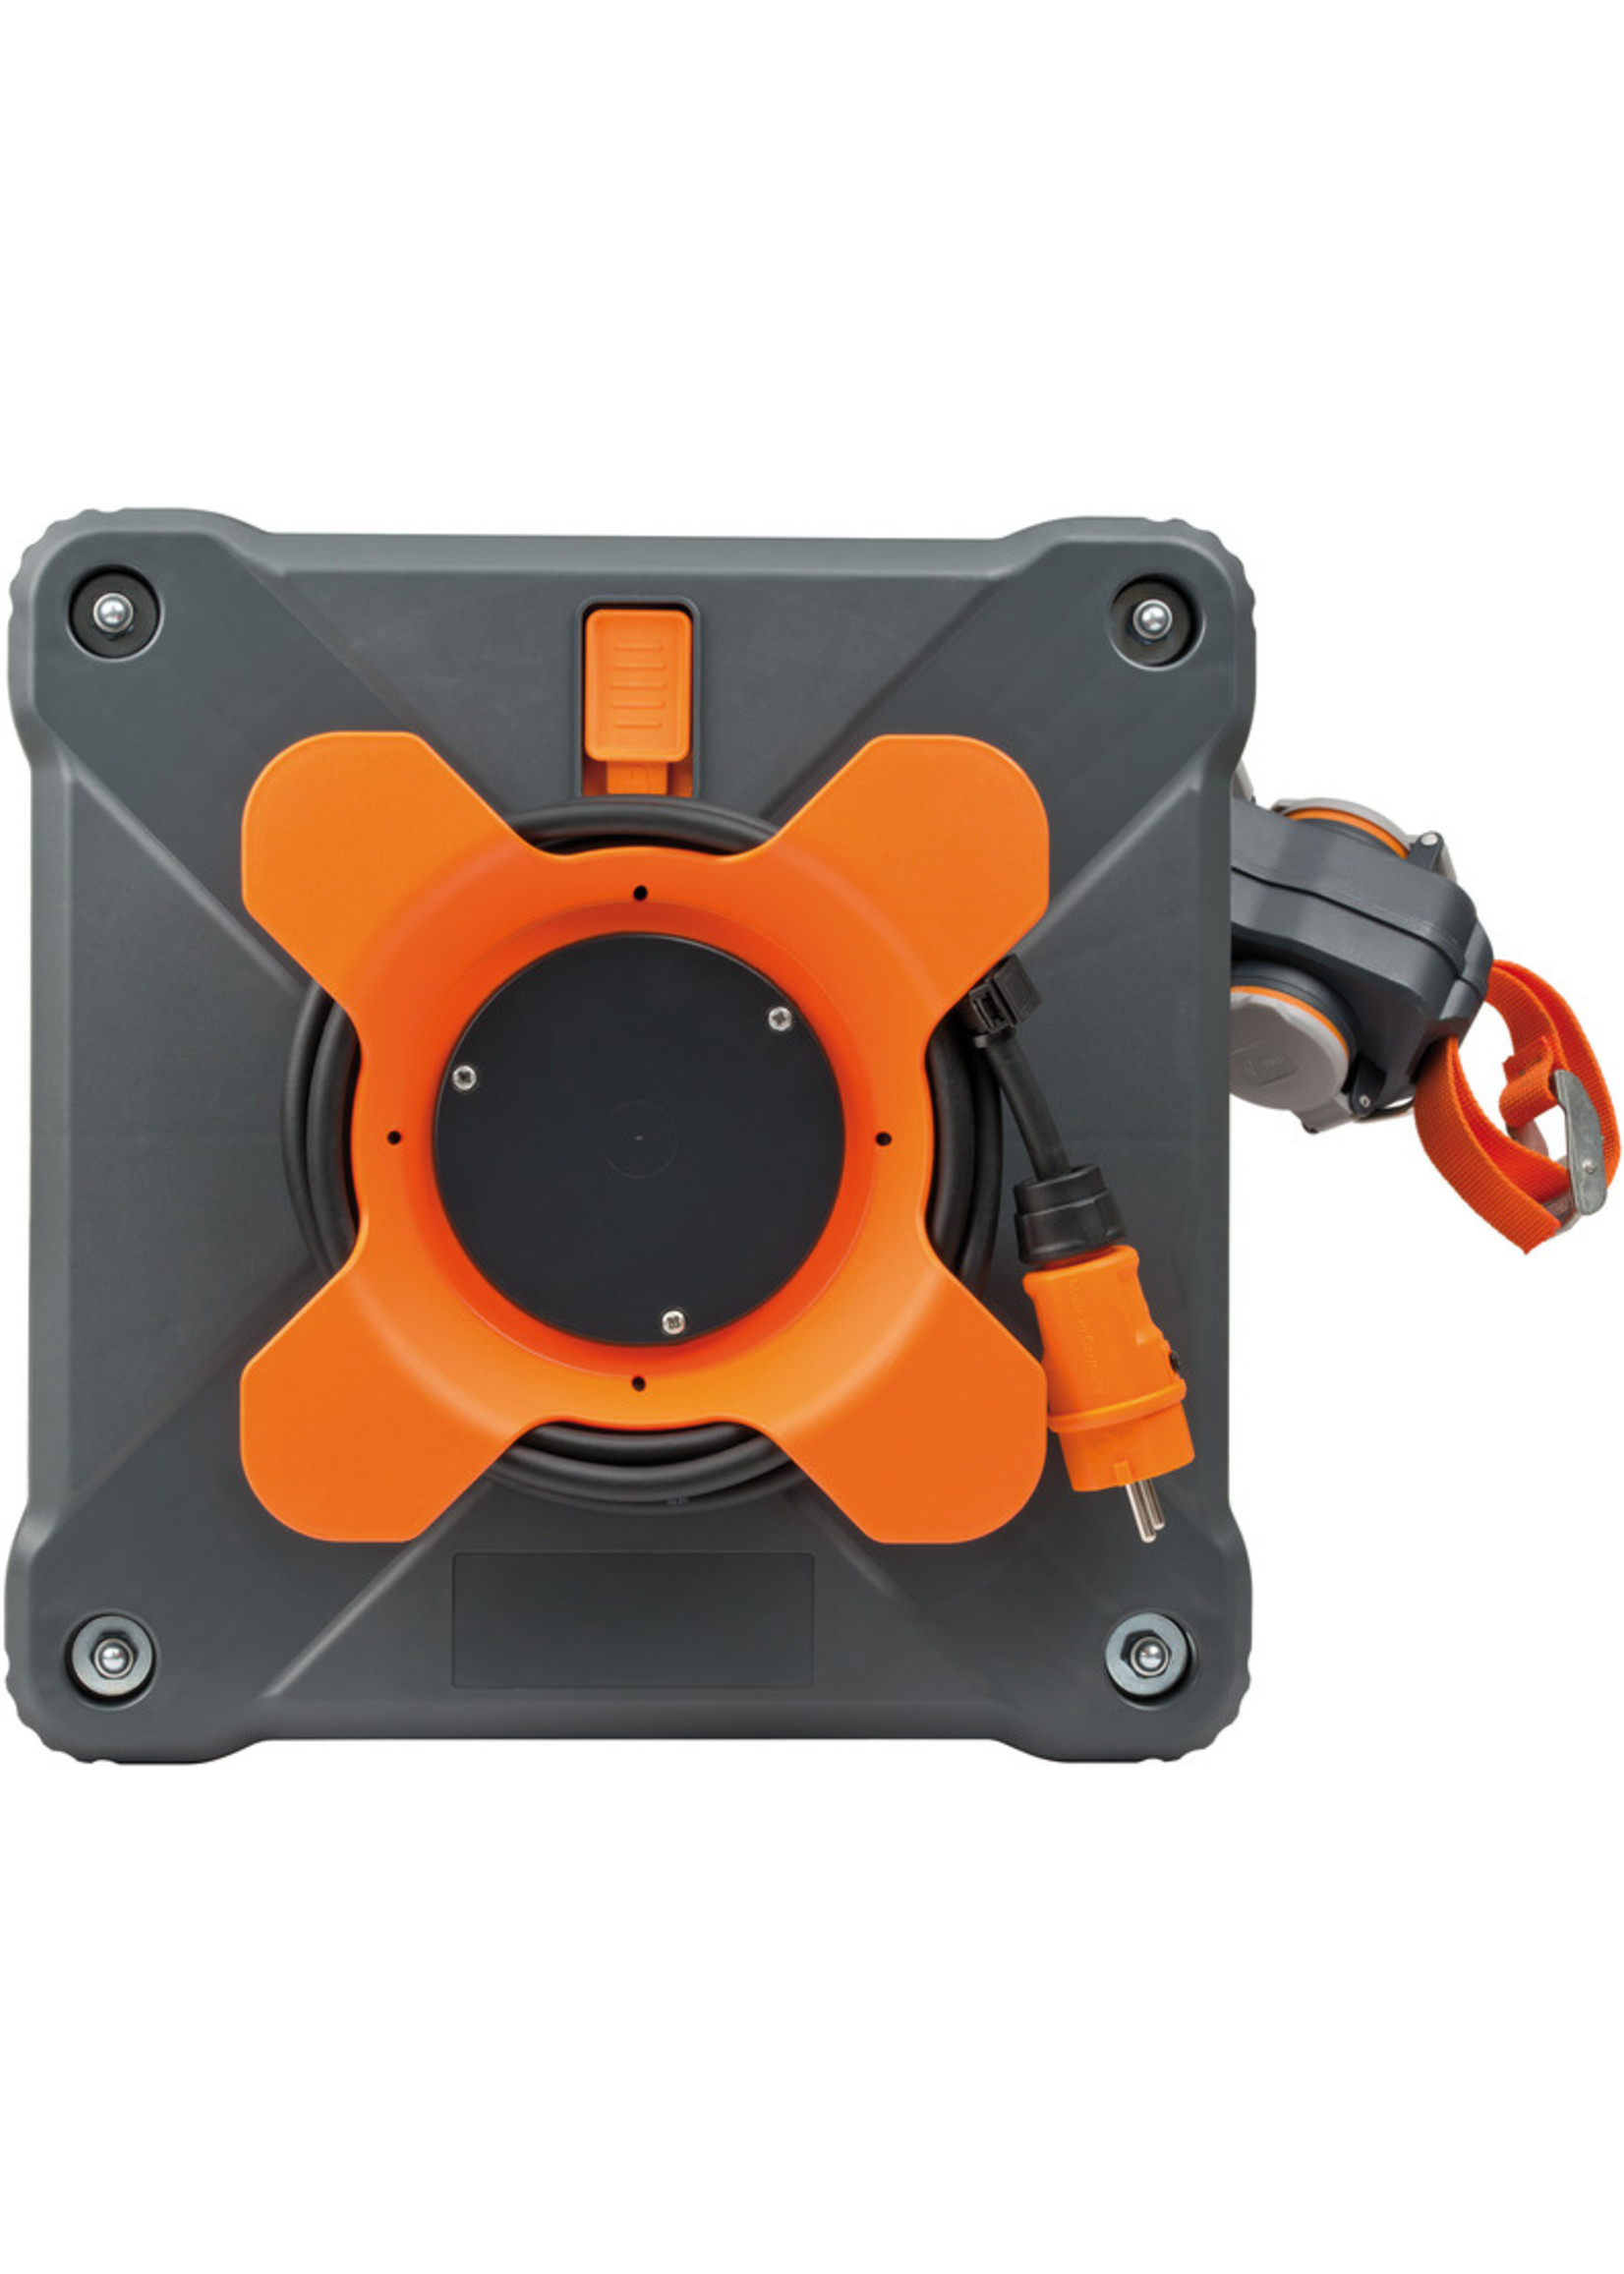 Brennenstuhl Brennenstuhl 9211380100 - Cube kabelhaspel IP44 33+5m H07RN-F 3G1.5